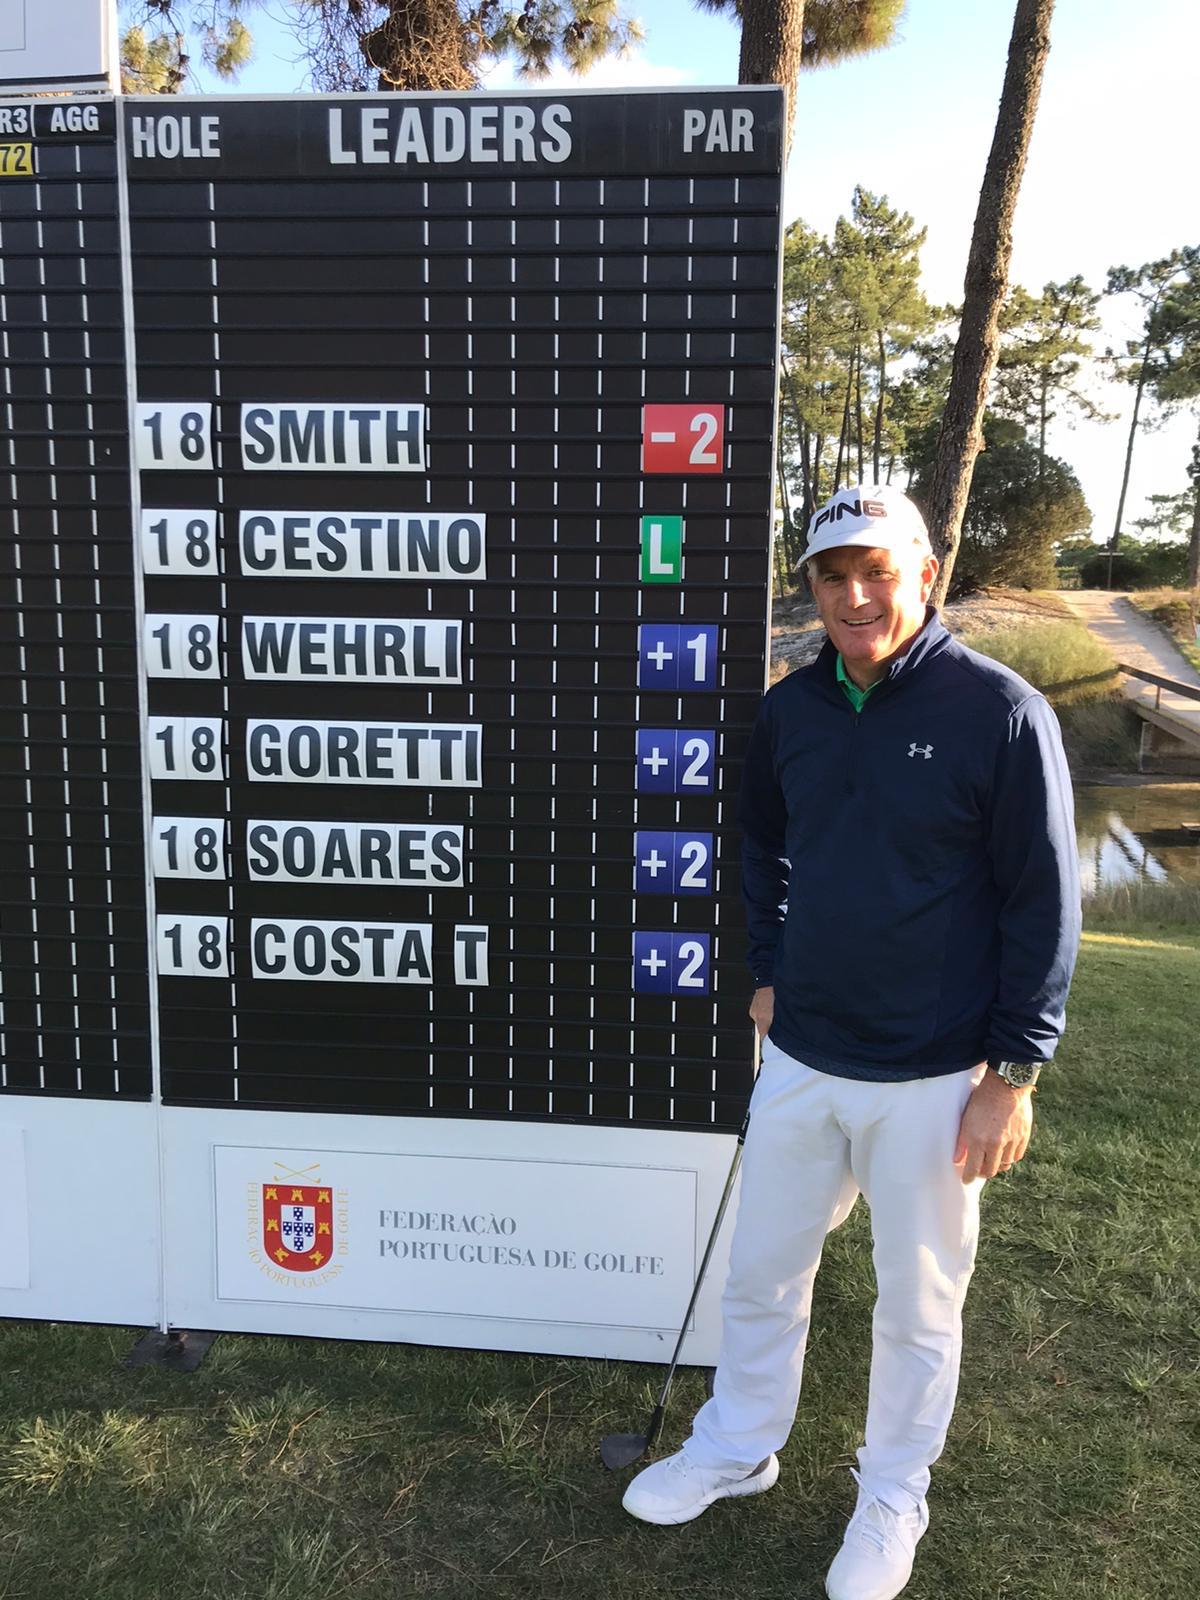 Campeonato Internacional Mid-Amateur de Portugal – Inglês Brad Smith na liderança, Tiago Costa e Manuel Violas Jr. no Top-10